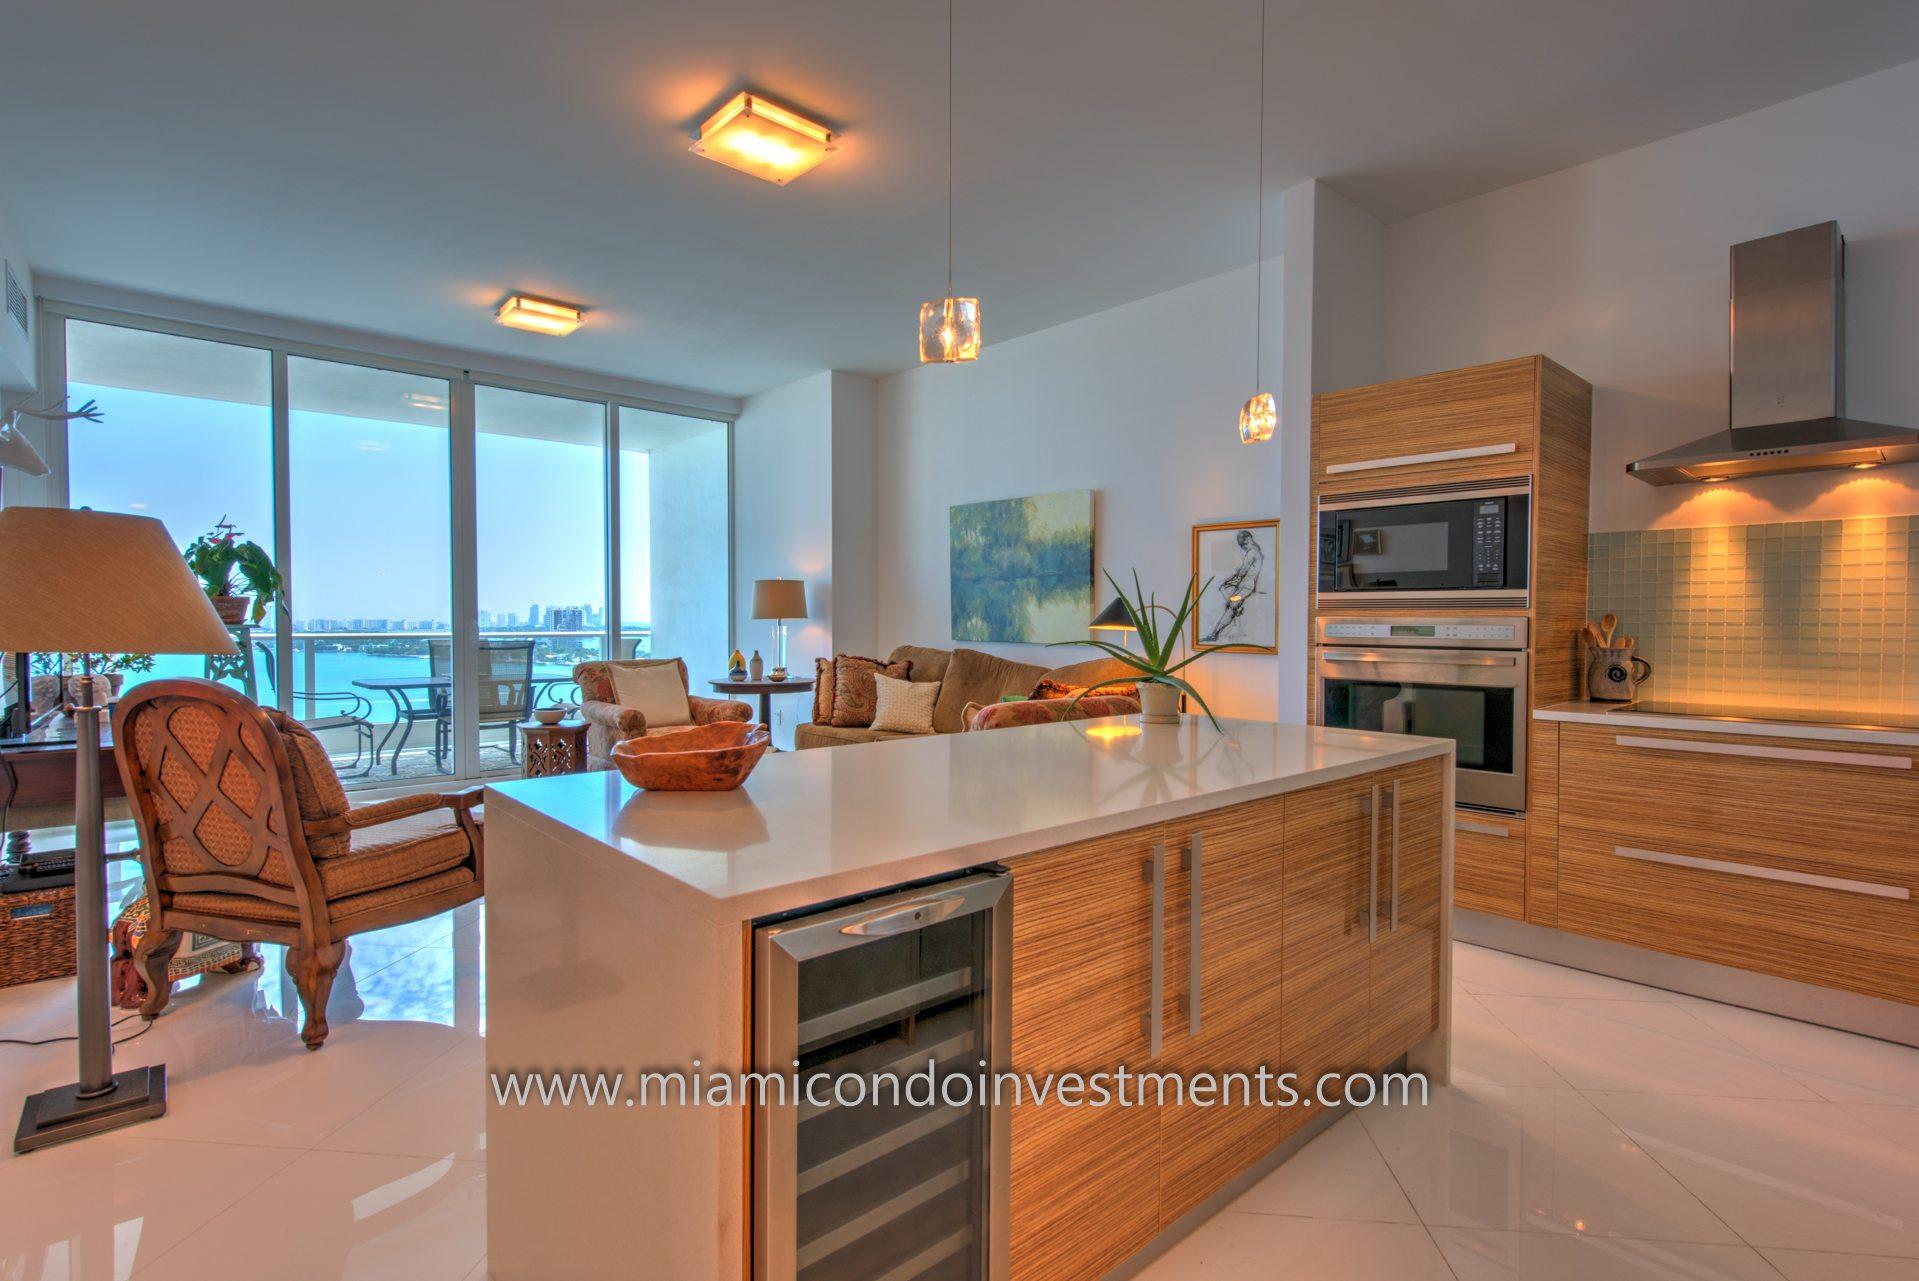 Paramount Bay Miami condos - view from kitchen